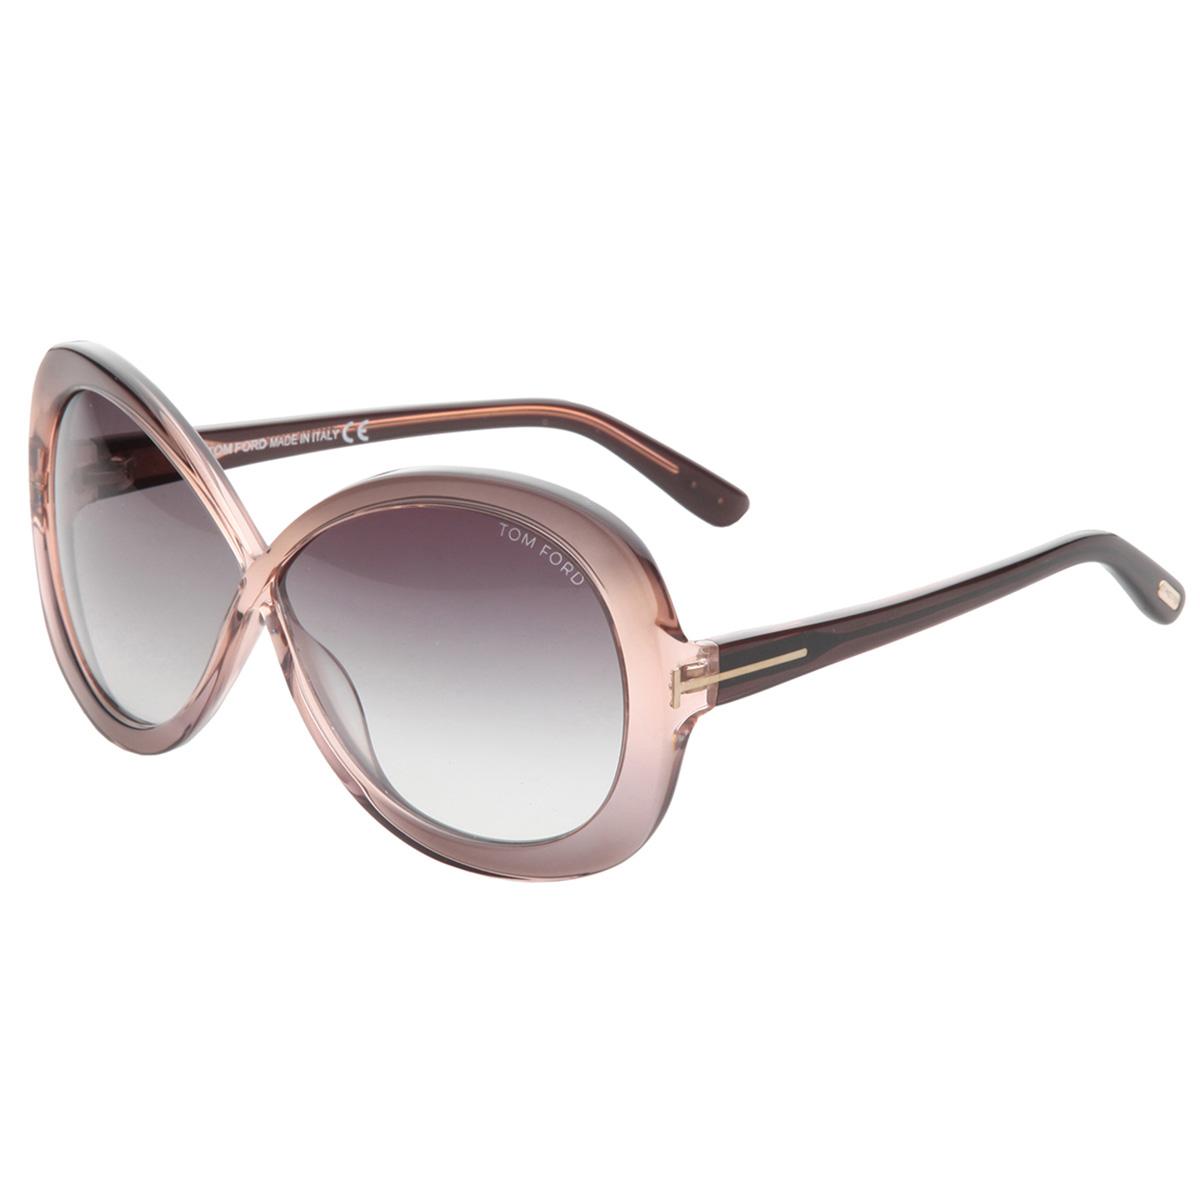 Tom Ford Sonnenbrille FT0226_74B Damen Sunglasses Lady\'s Rosa Lila ...